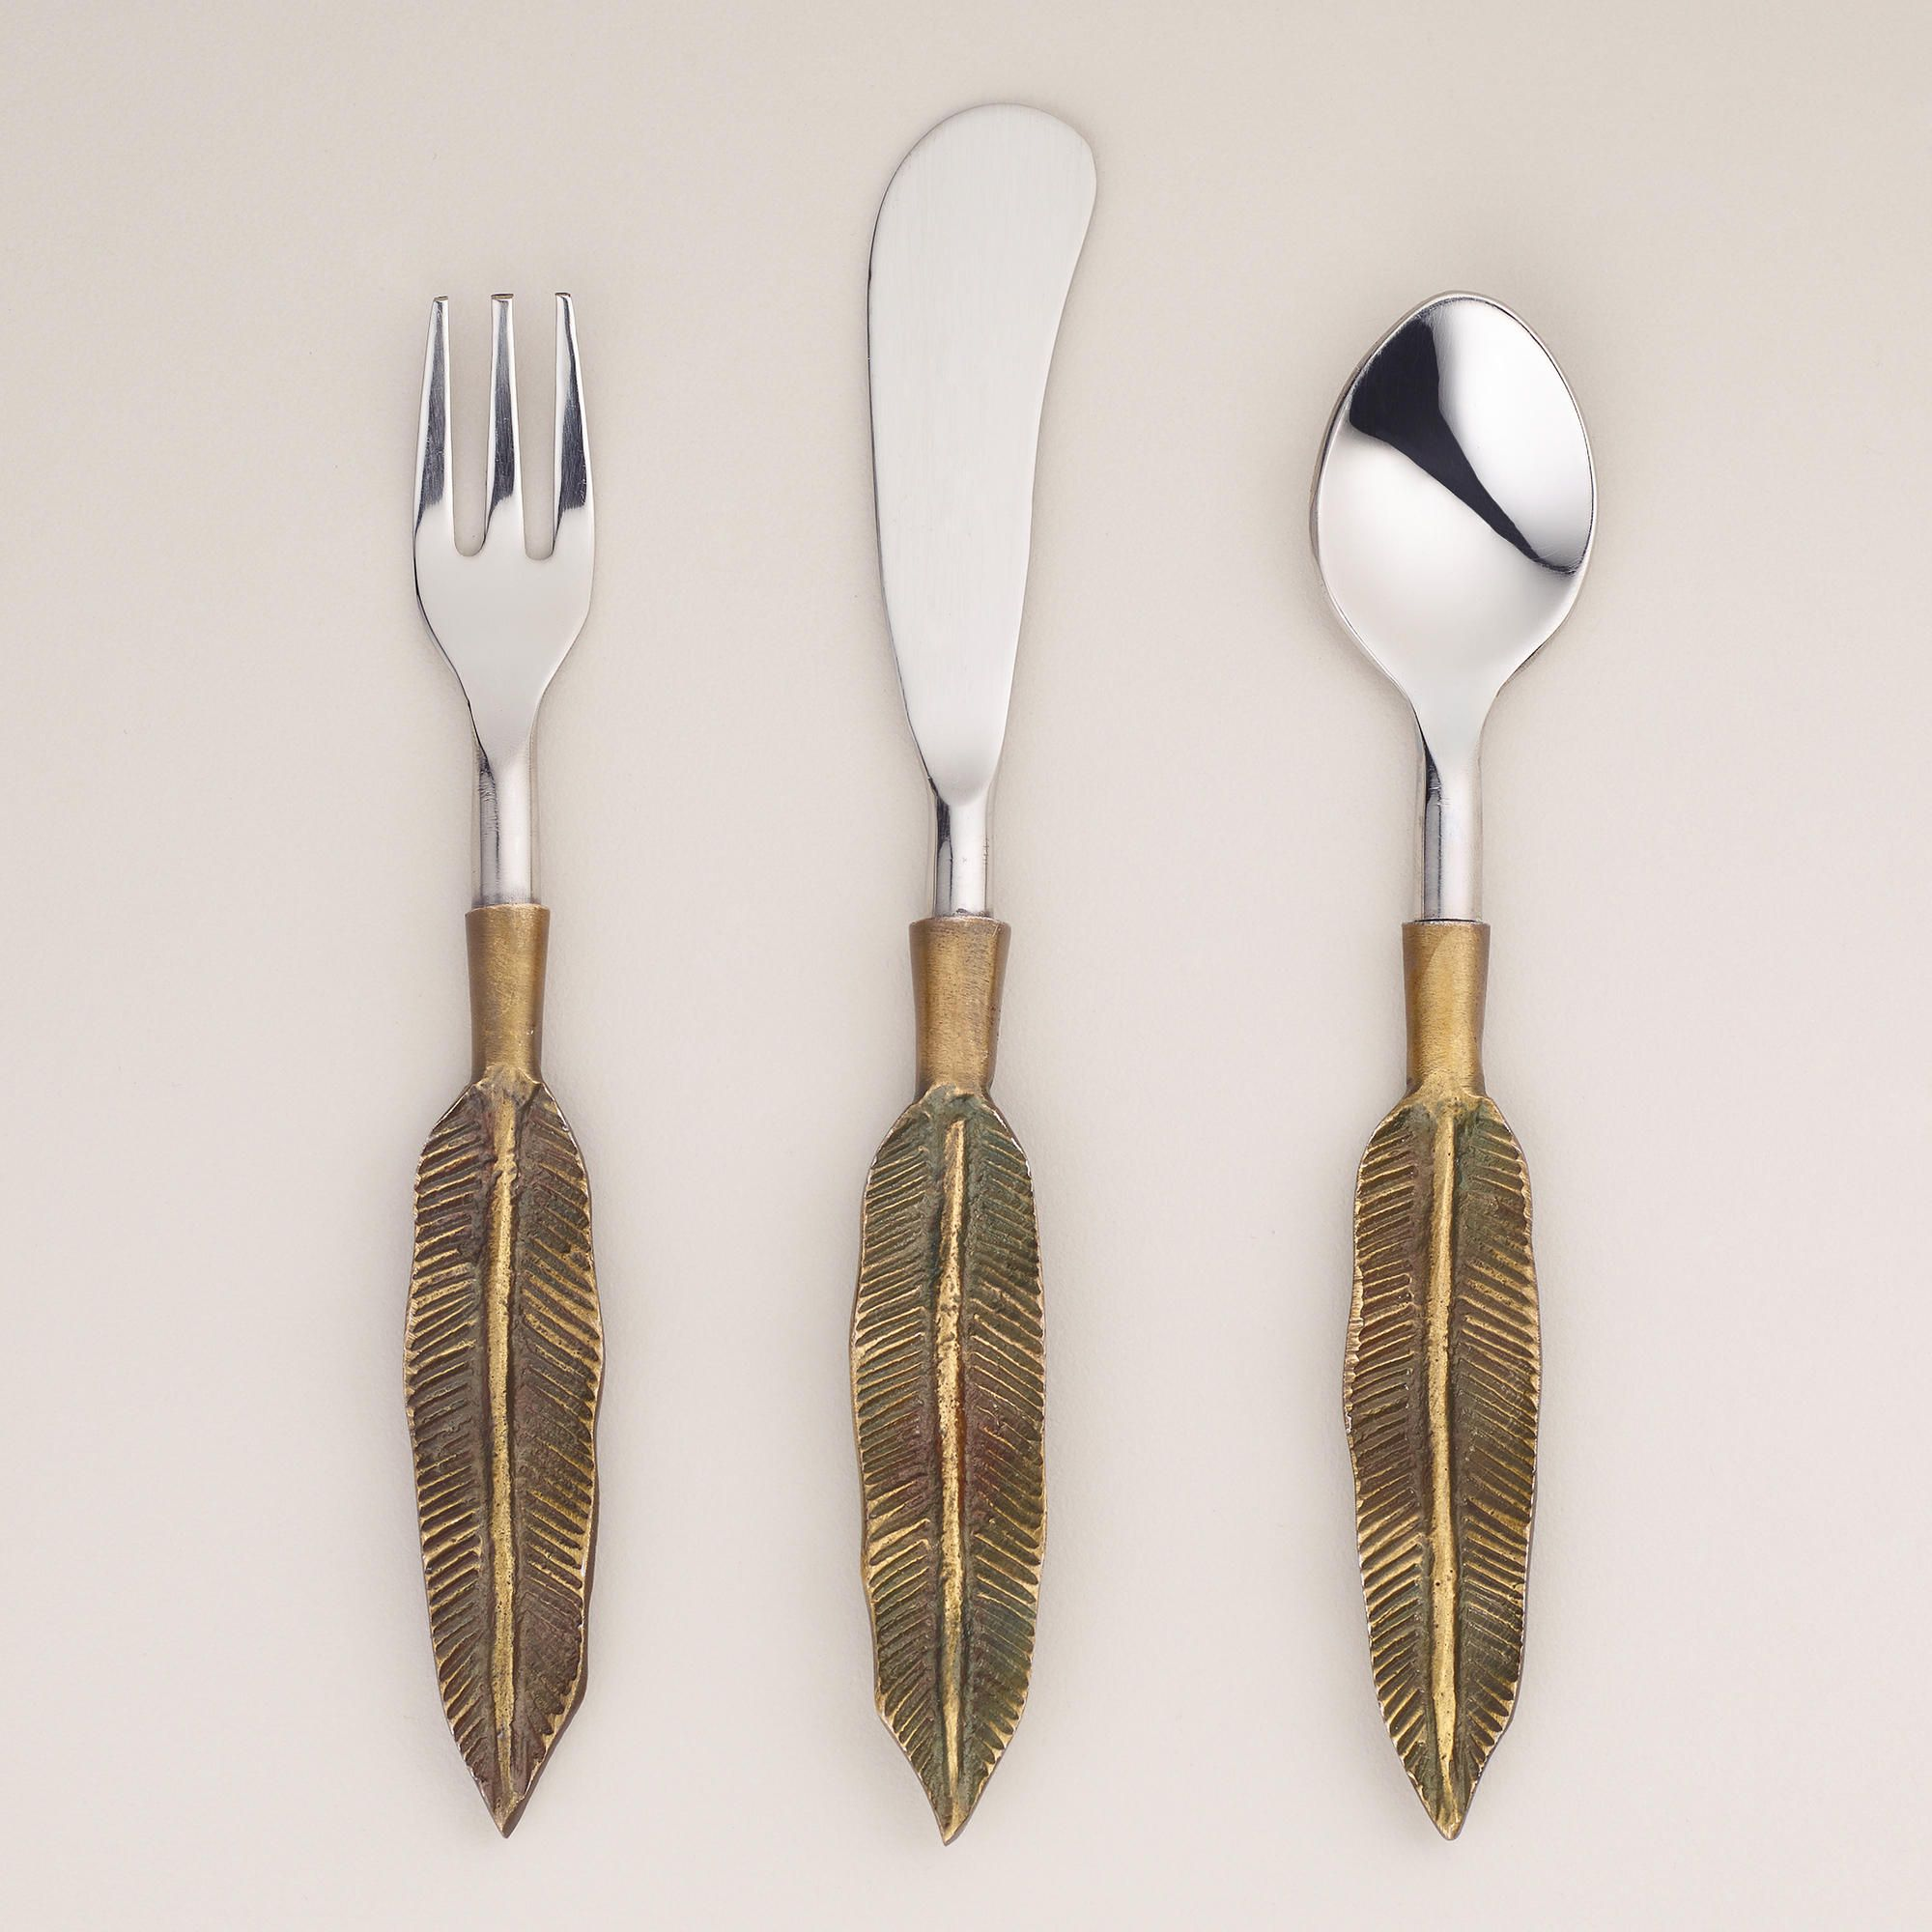 stupendous 18 10 flatware sets. Feather Cocktail Flatware Collection  World Market Kitchen